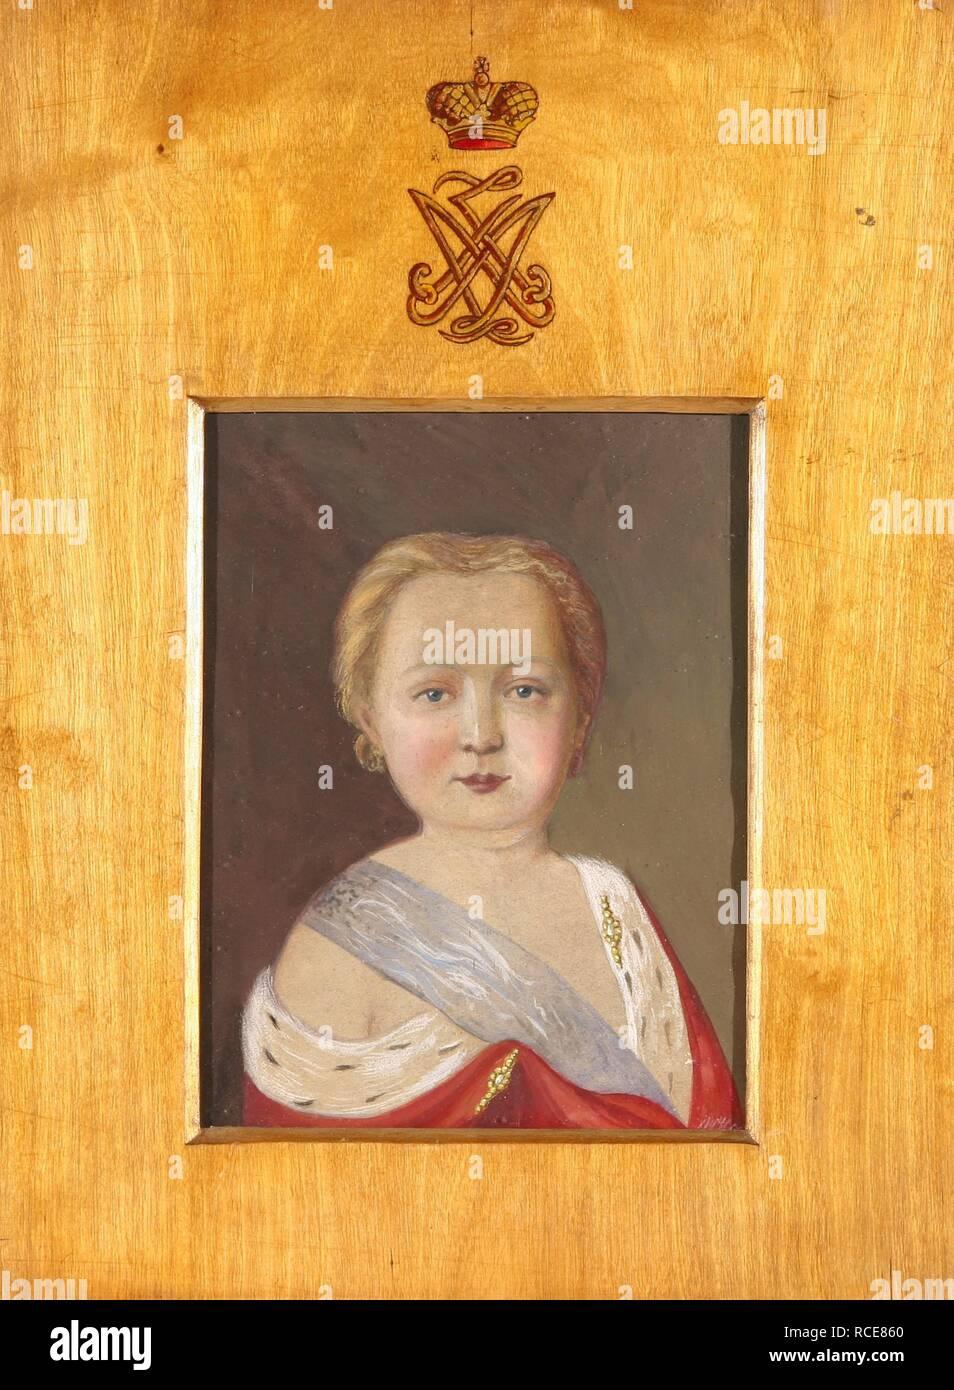 Portrait of Alexander I as a Child. Museum: PRIVATE COLLECTION. Author: Hau (Gau), Vladimir Ivanovich. Stock Photo